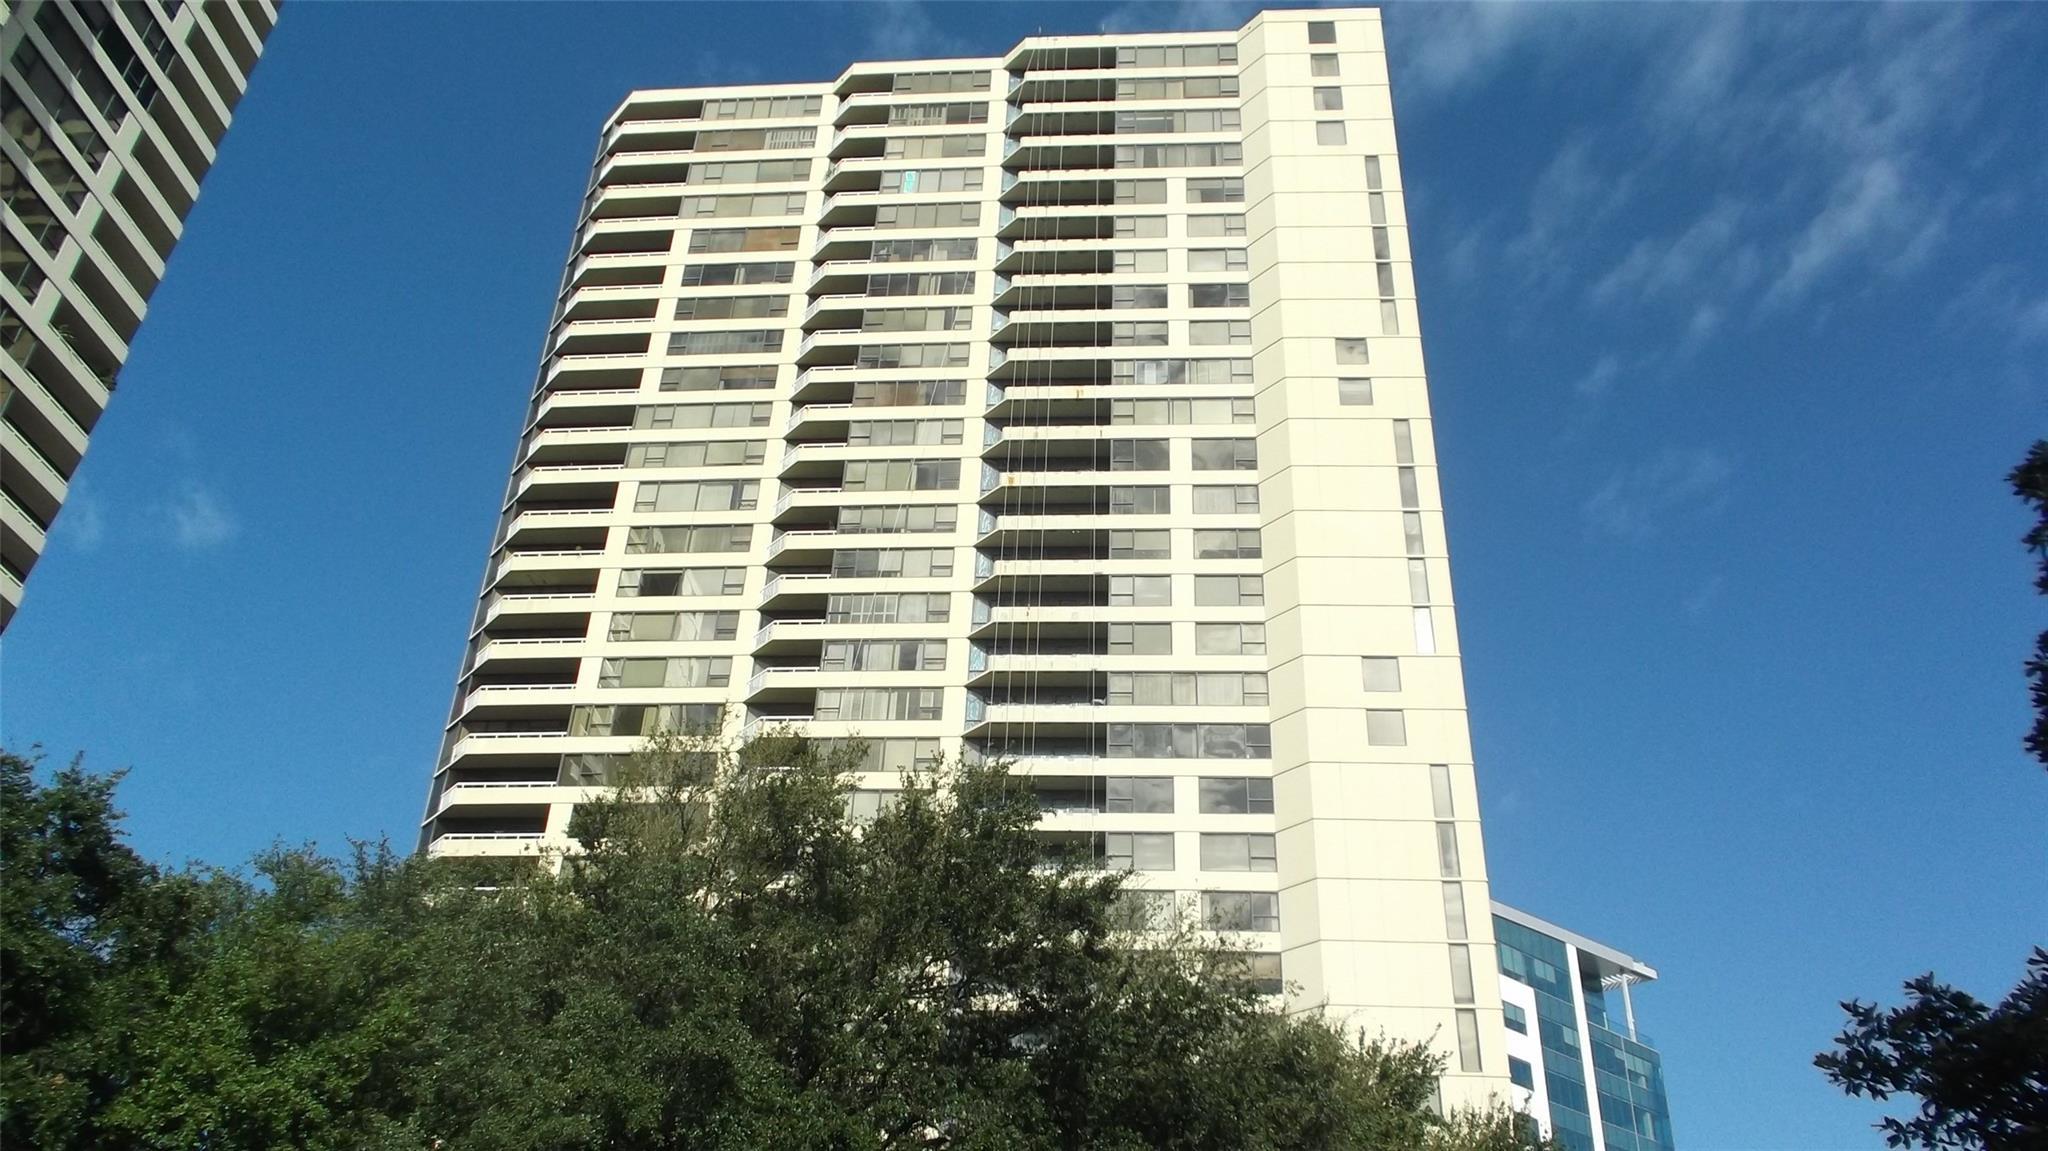 14 GREENWAY Plaza #4L Property Photo - Houston, TX real estate listing